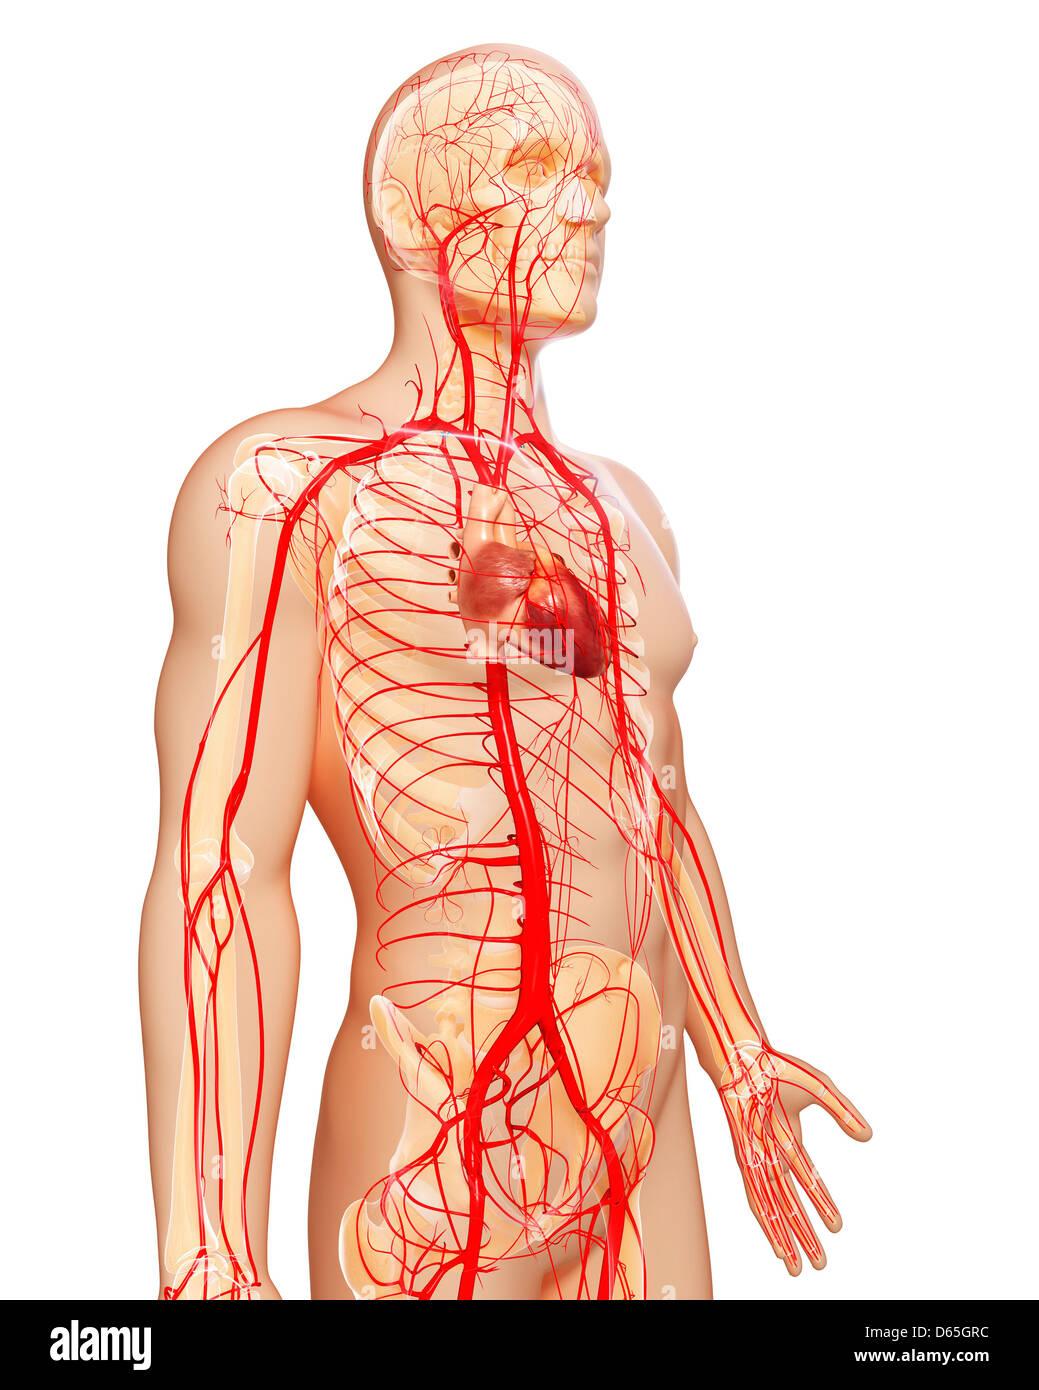 Human Arteries Artwork Stock Photo 55442000 Alamy